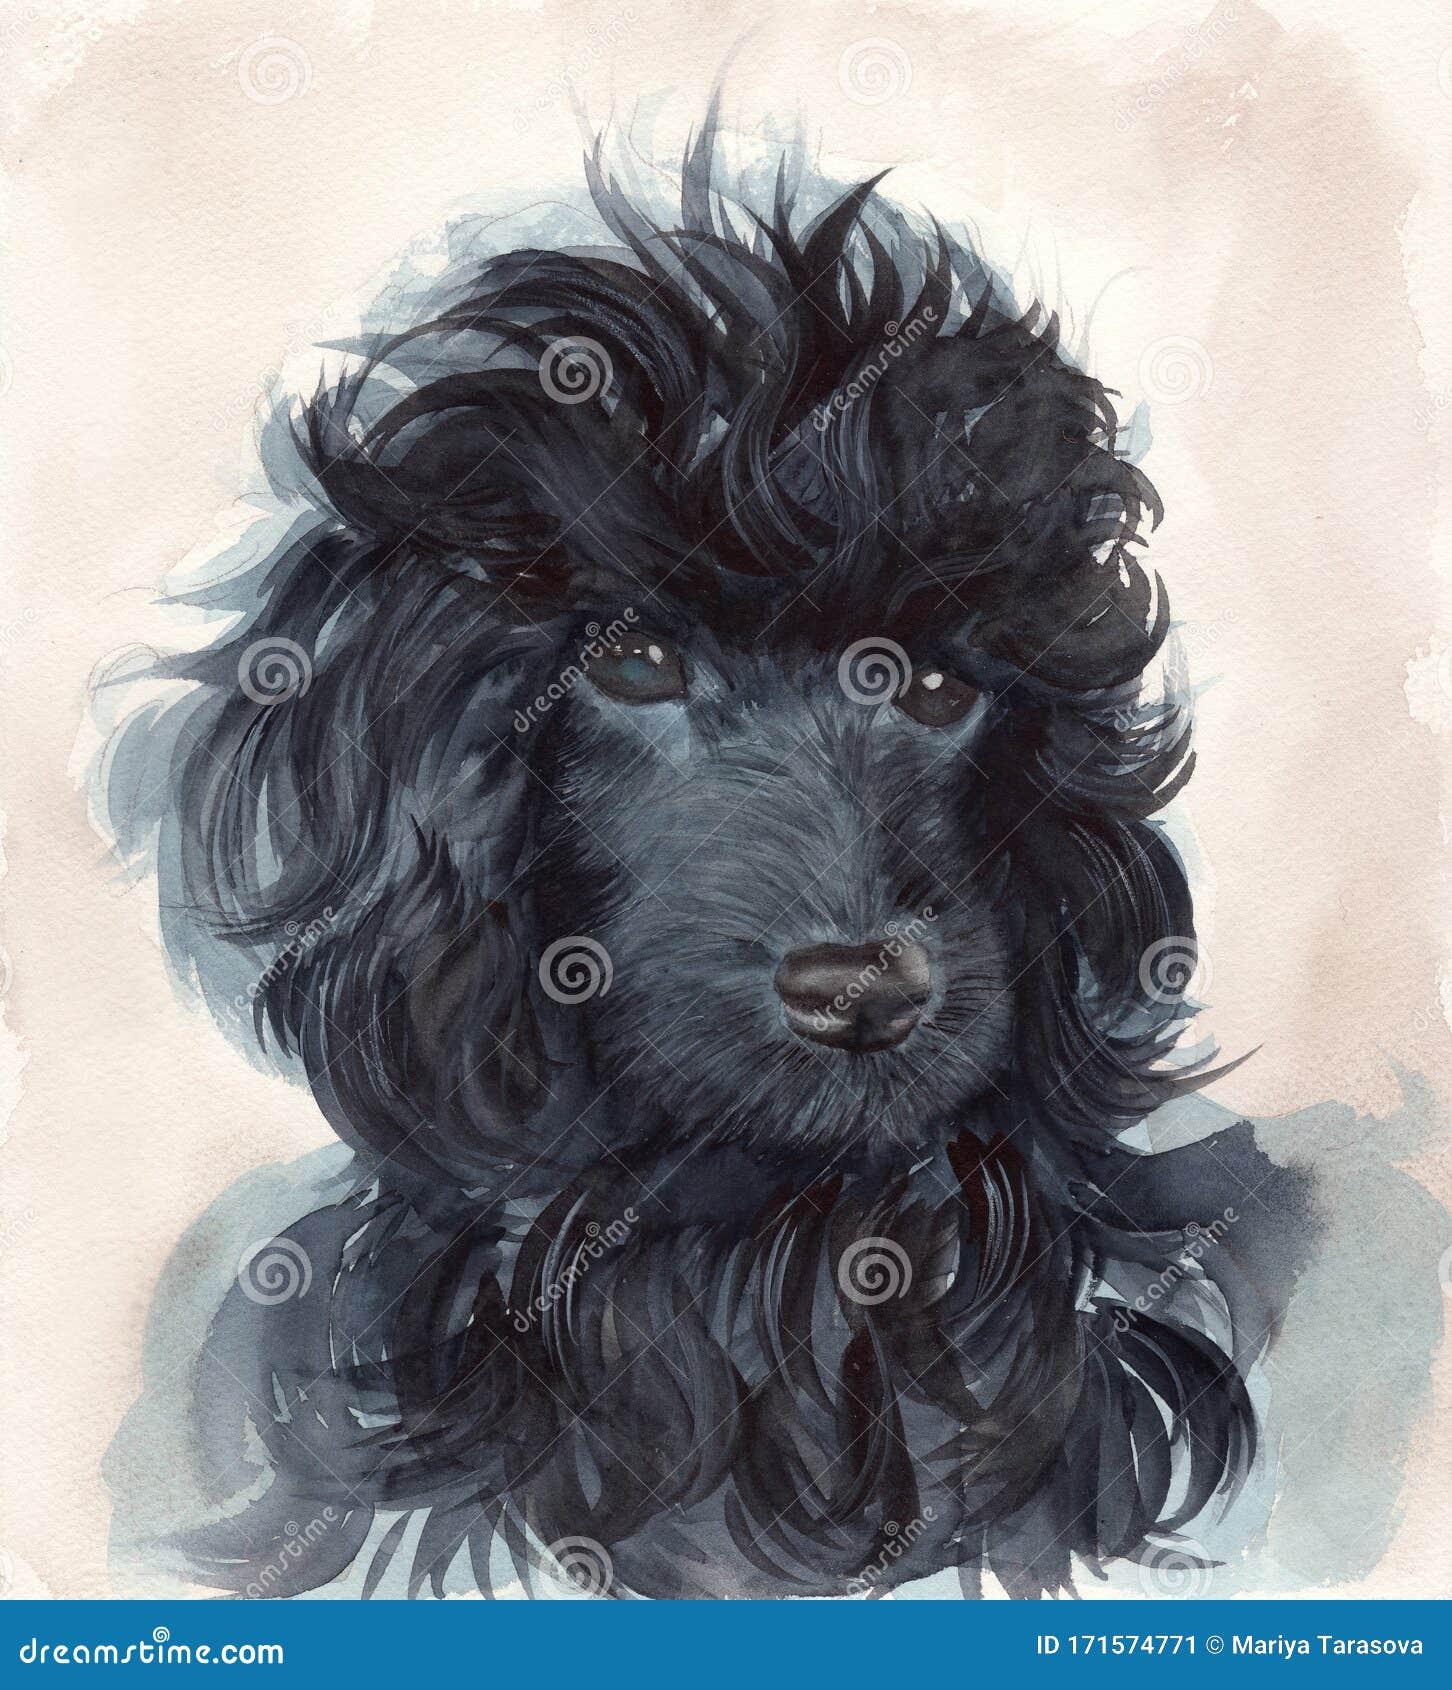 Black Poodle Stock Illustrations 1 818 Black Poodle Stock Illustrations Vectors Clipart Dreamstime